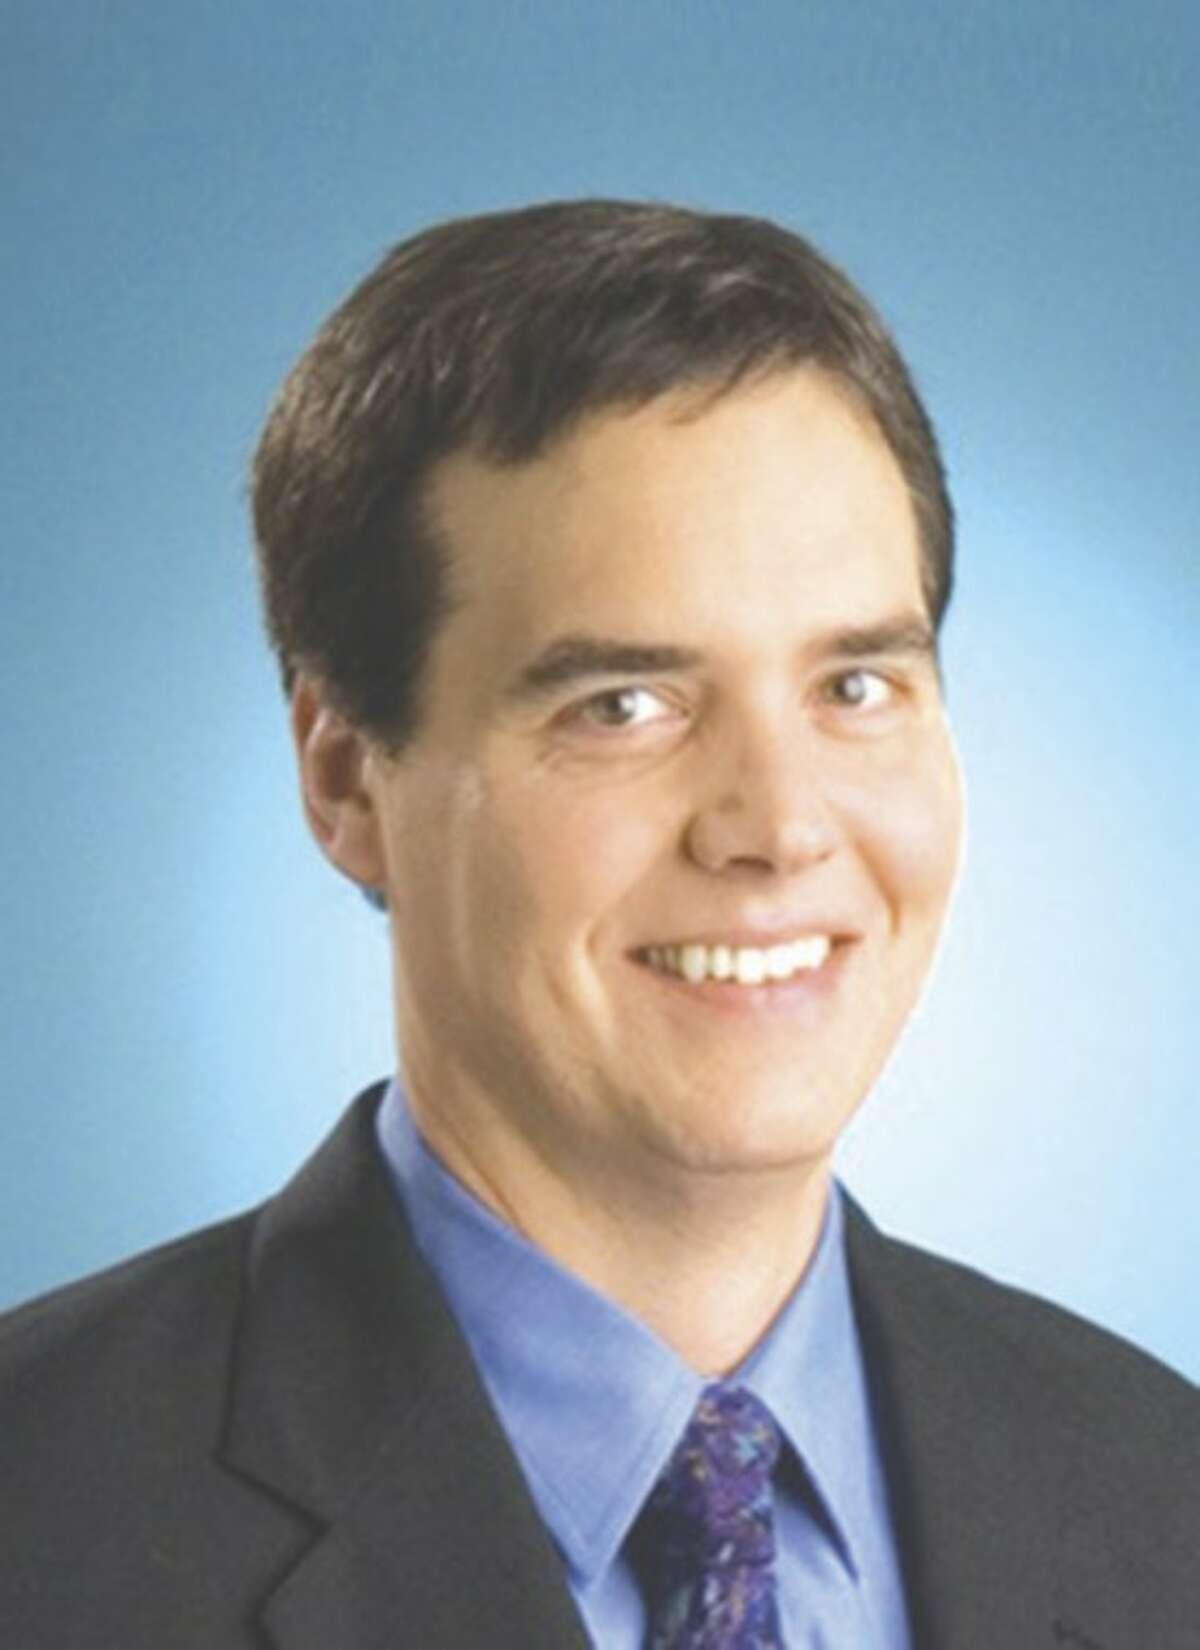 Robert Noecker, MD, MBA